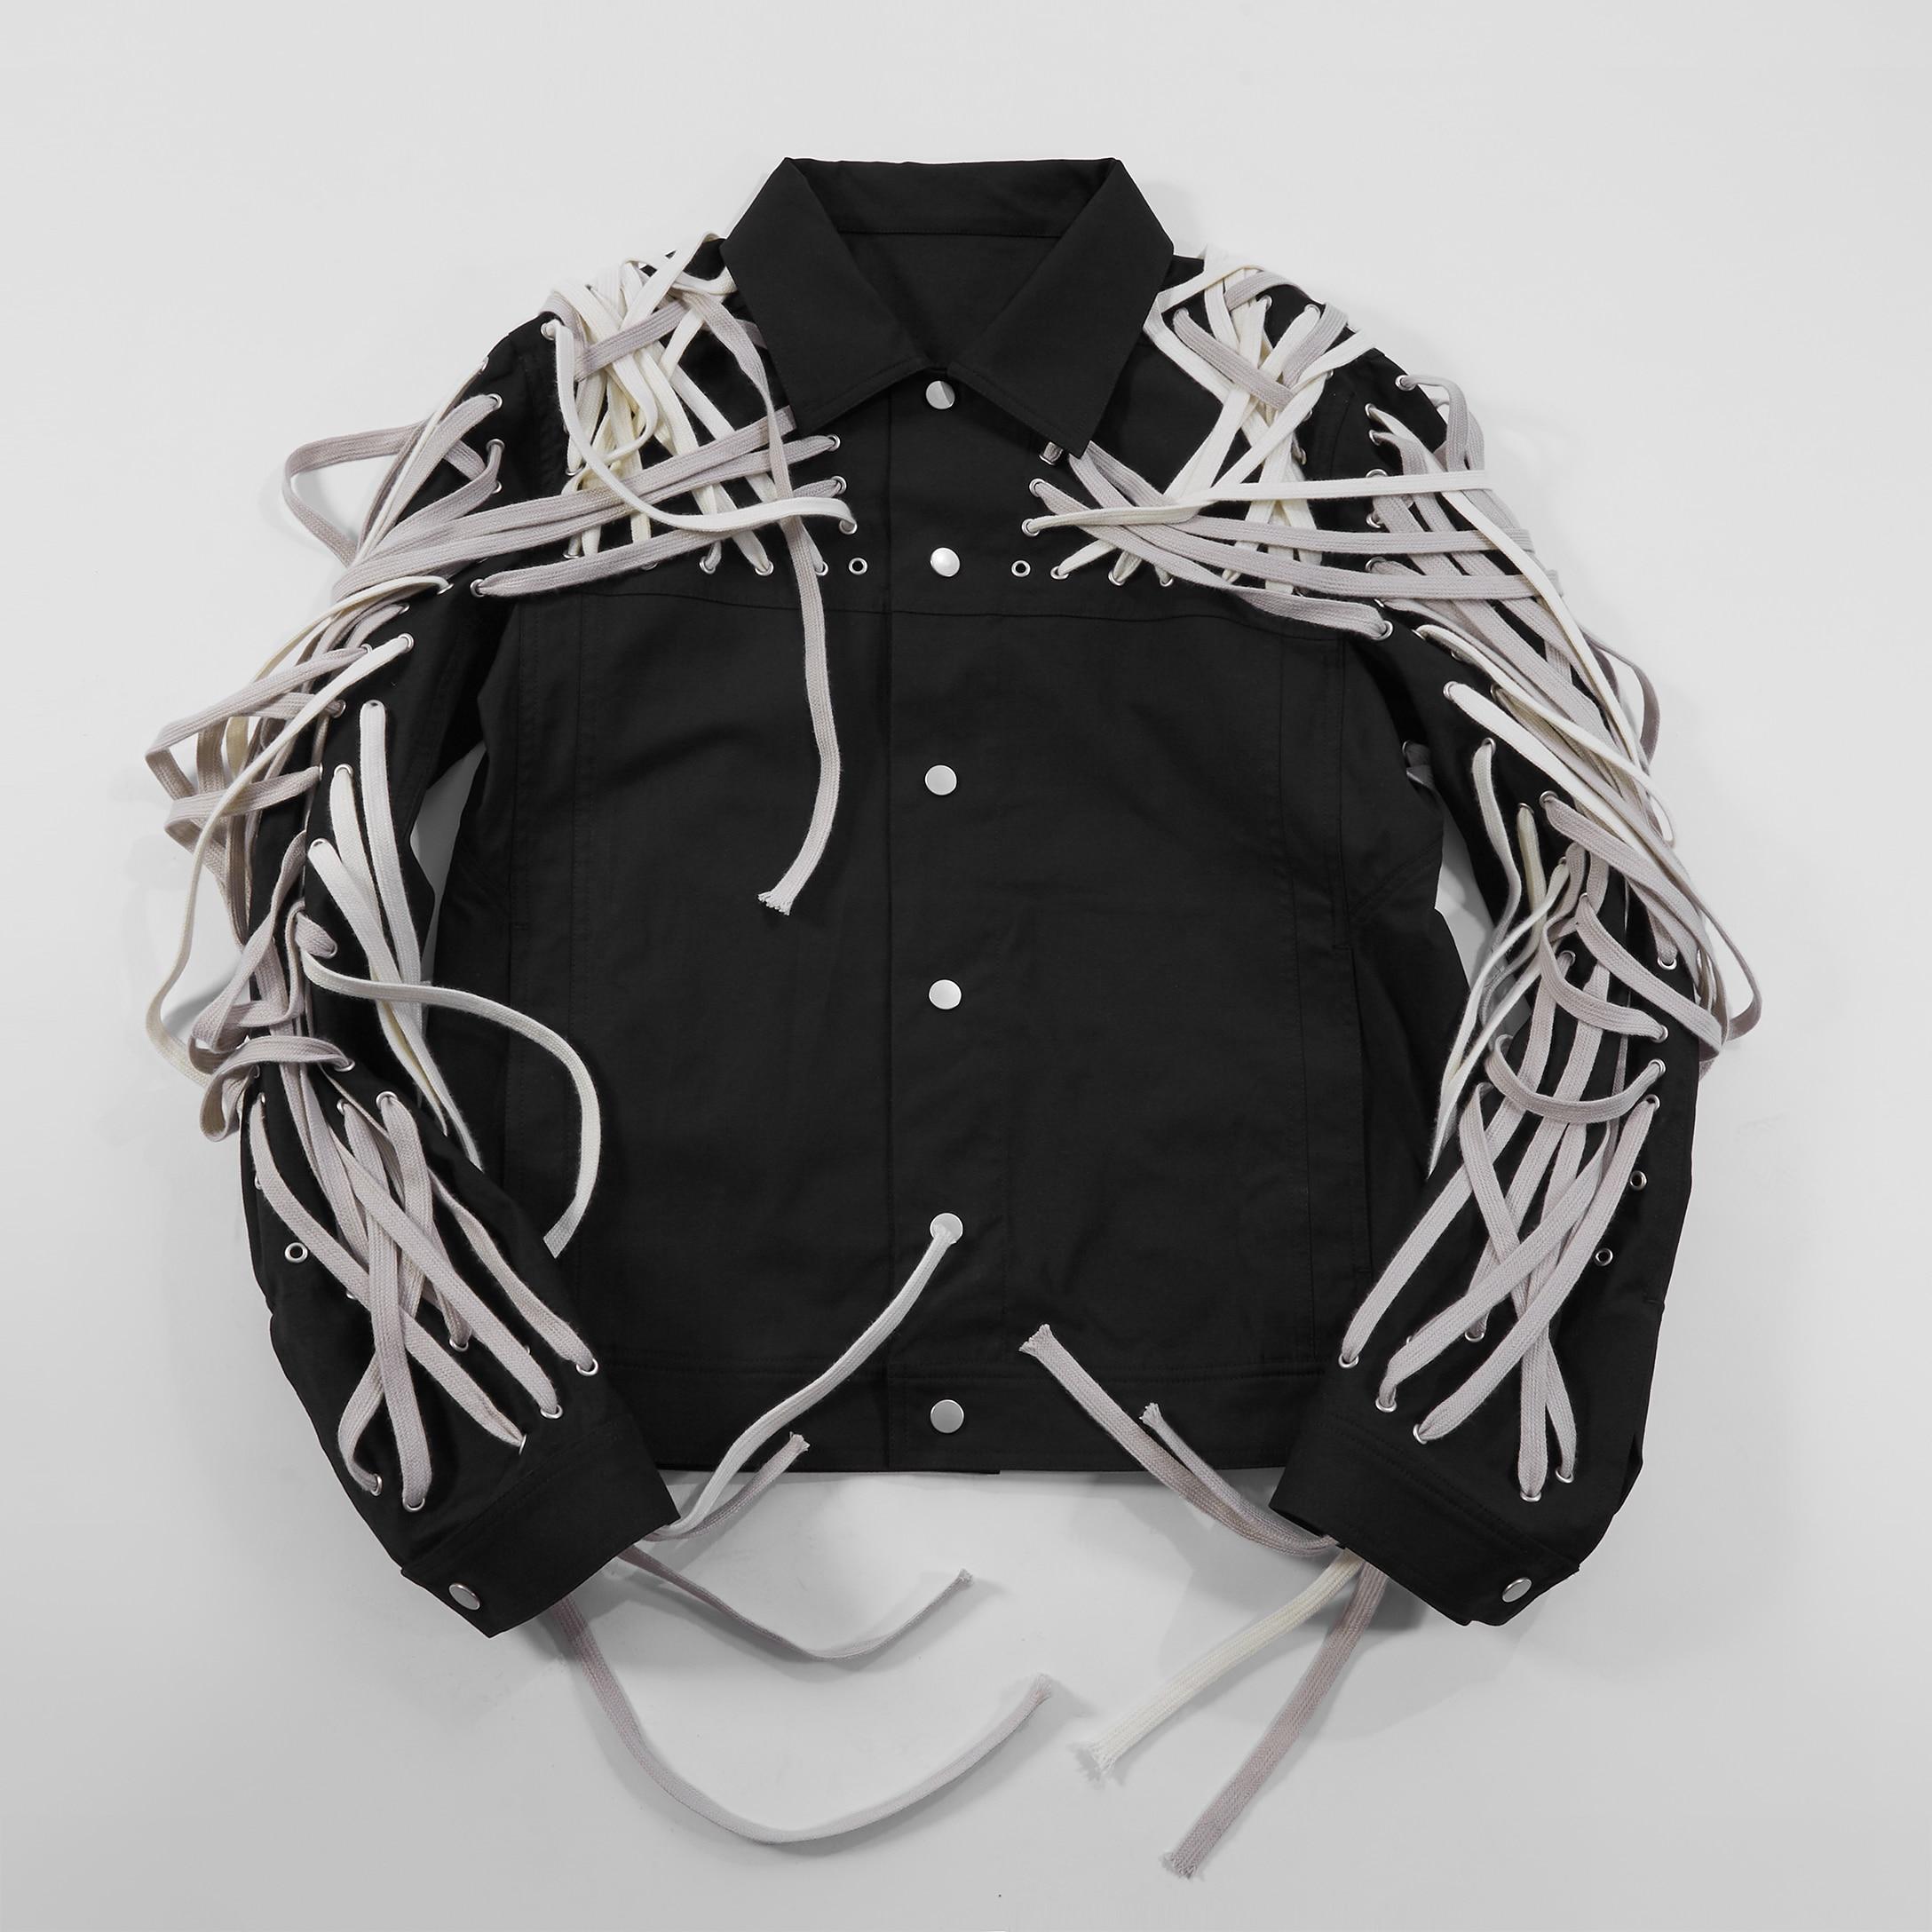 20ss Owen seak Men Cotton Jacket Gothic Style Men's Clothing Autumn Zipper Flying Jacket Men Solid Black Coat